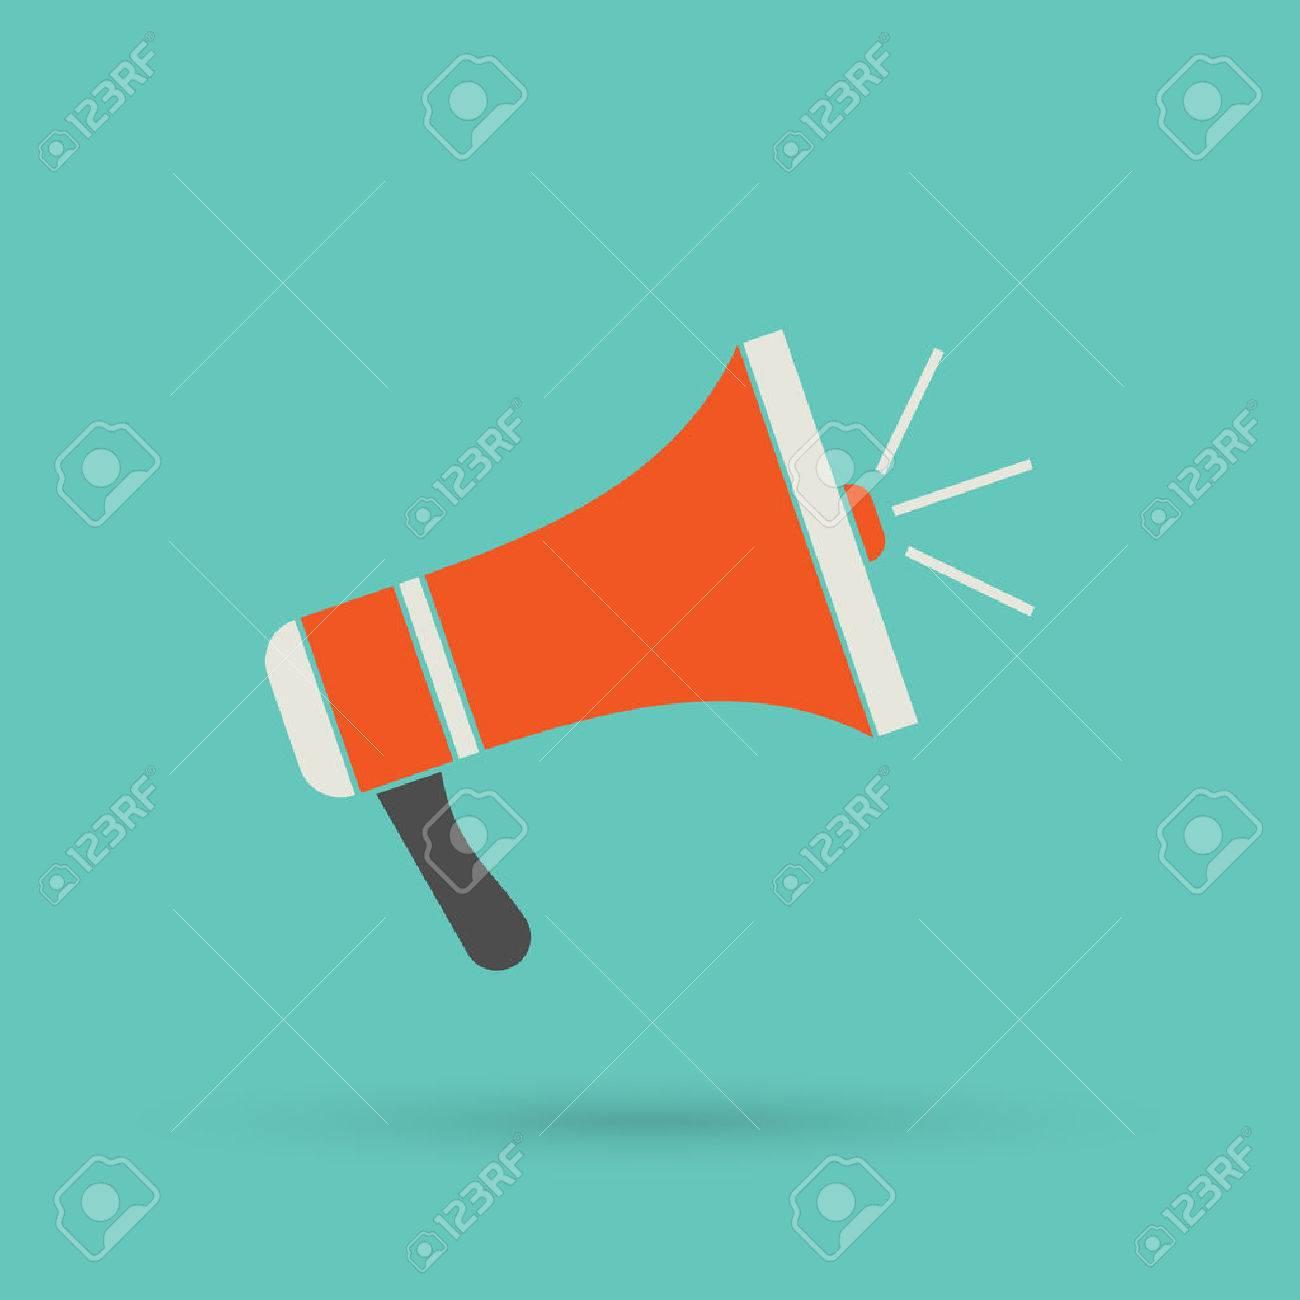 Flat red loudspeaker icon. Vector illustration megaphone - 41137655